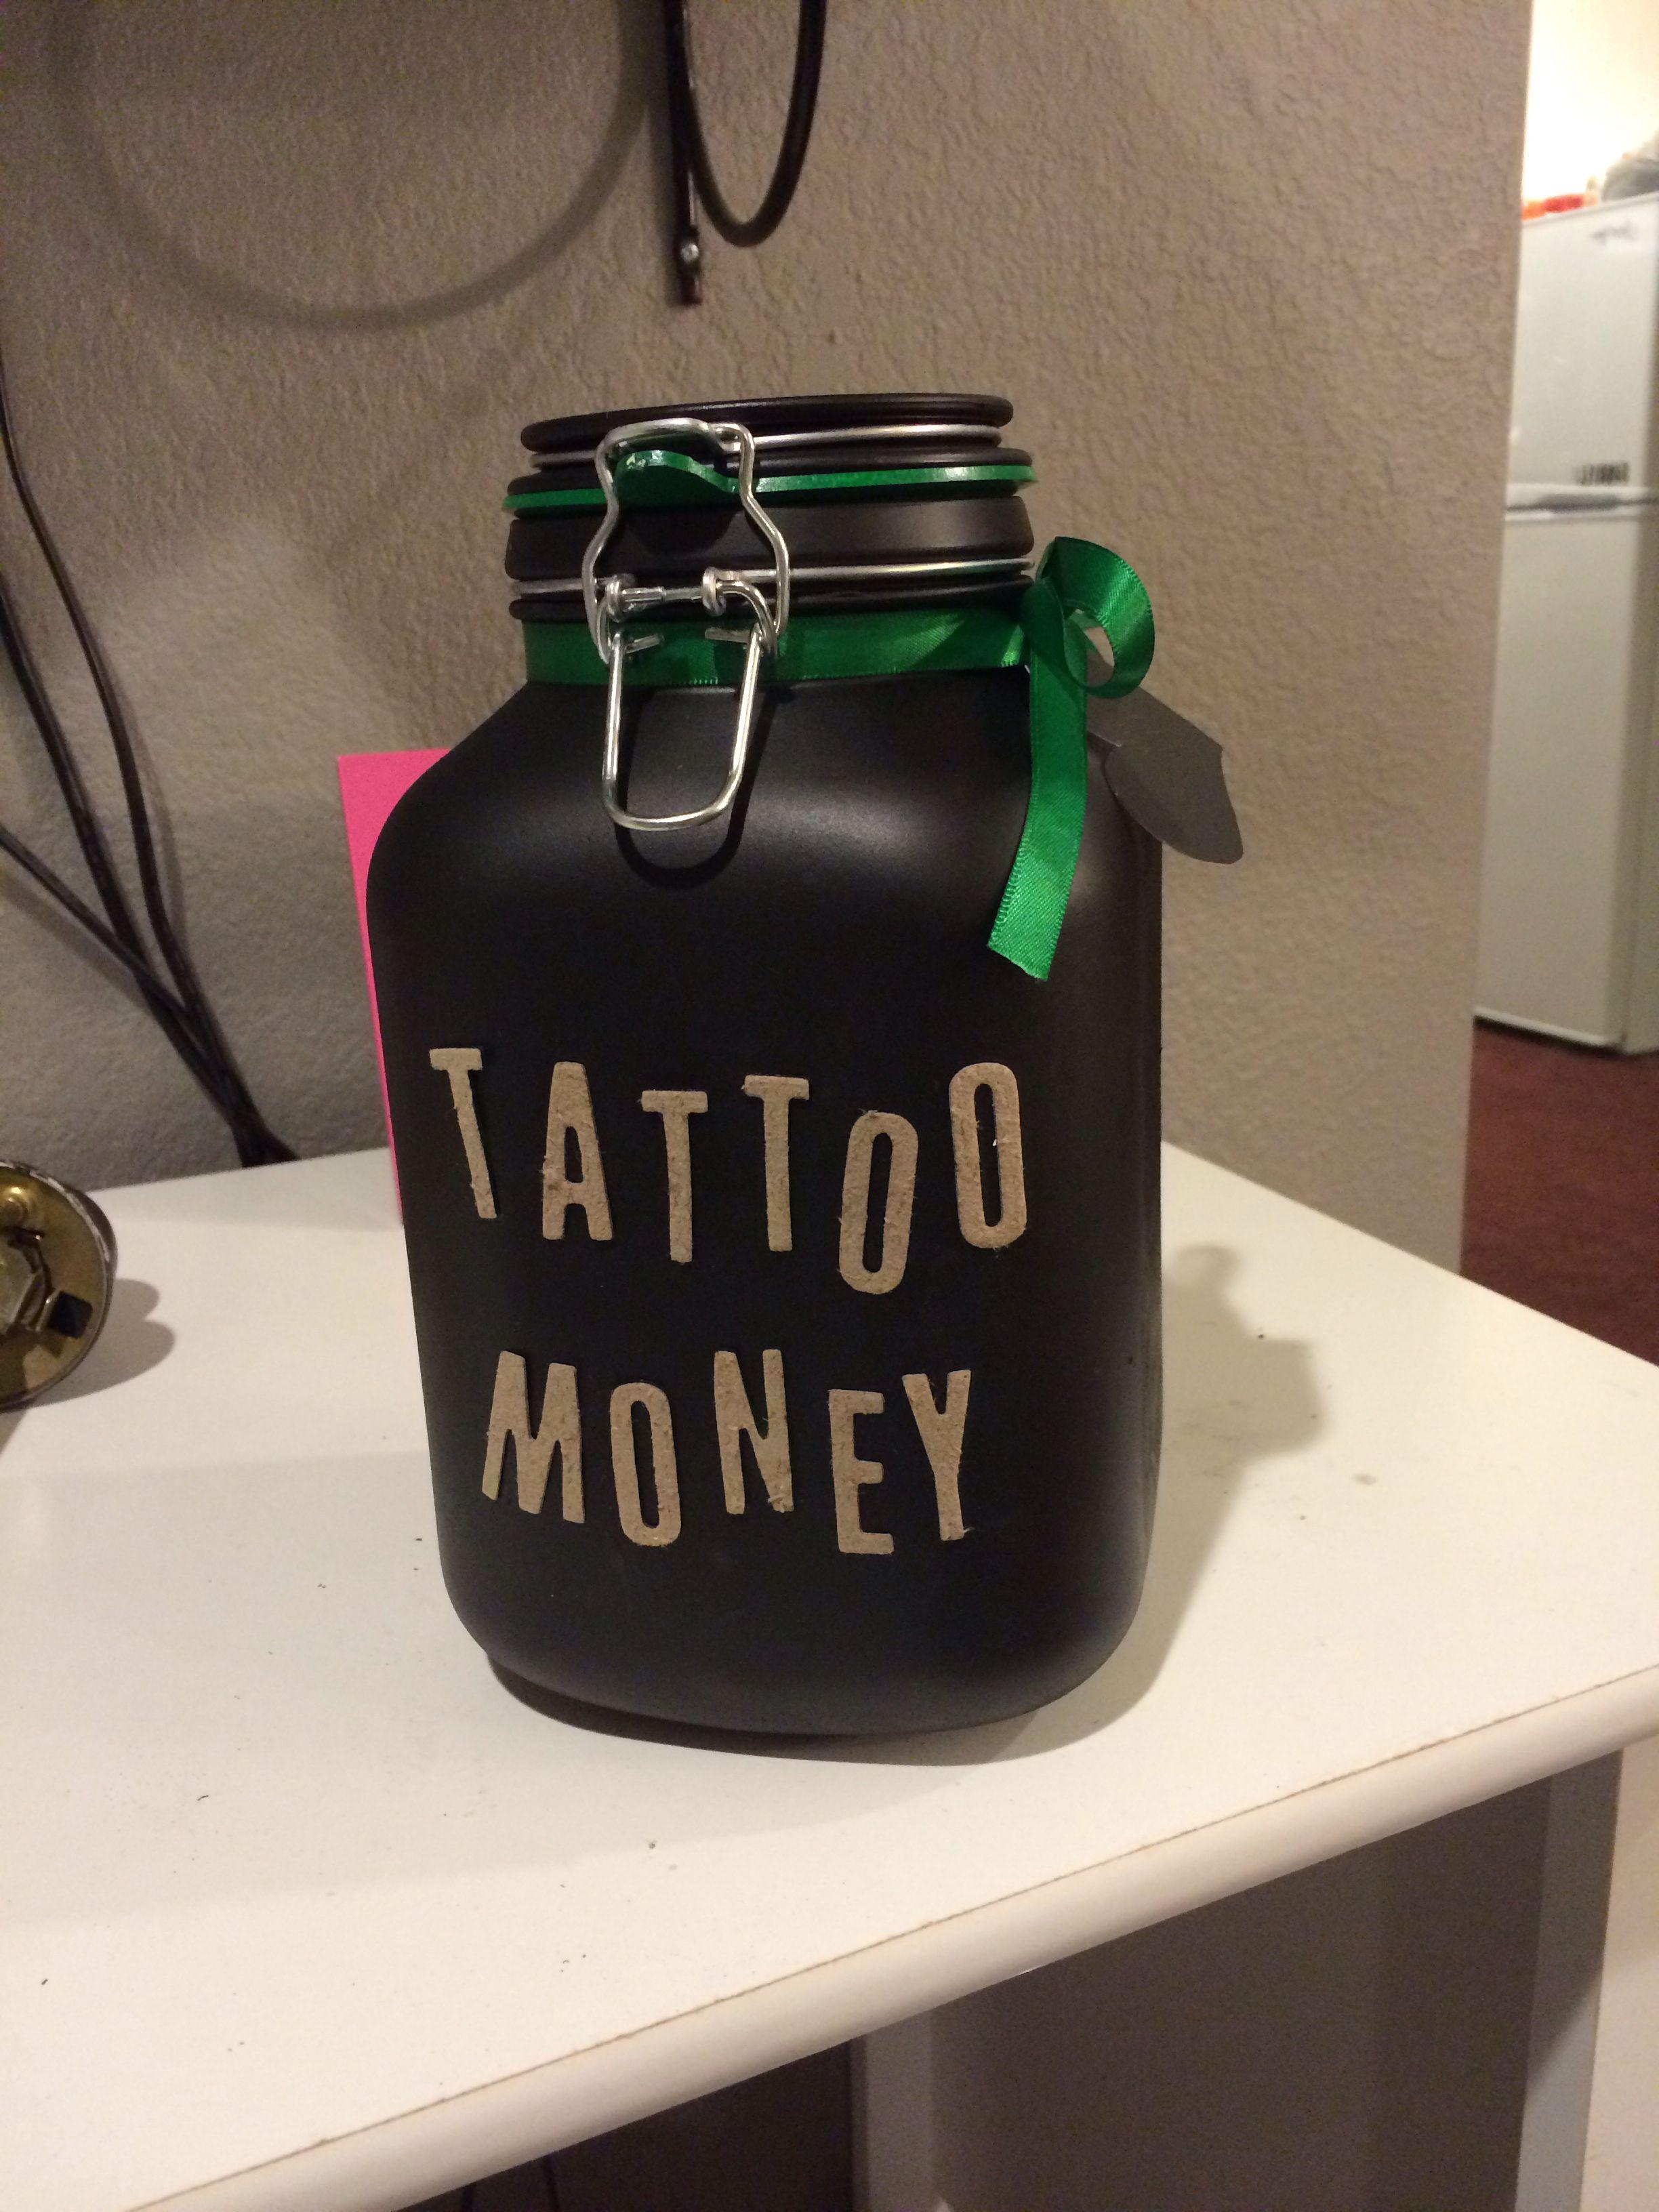 Spray Painted Jar I Made For My Boyfriends Tattoo Money Wedding